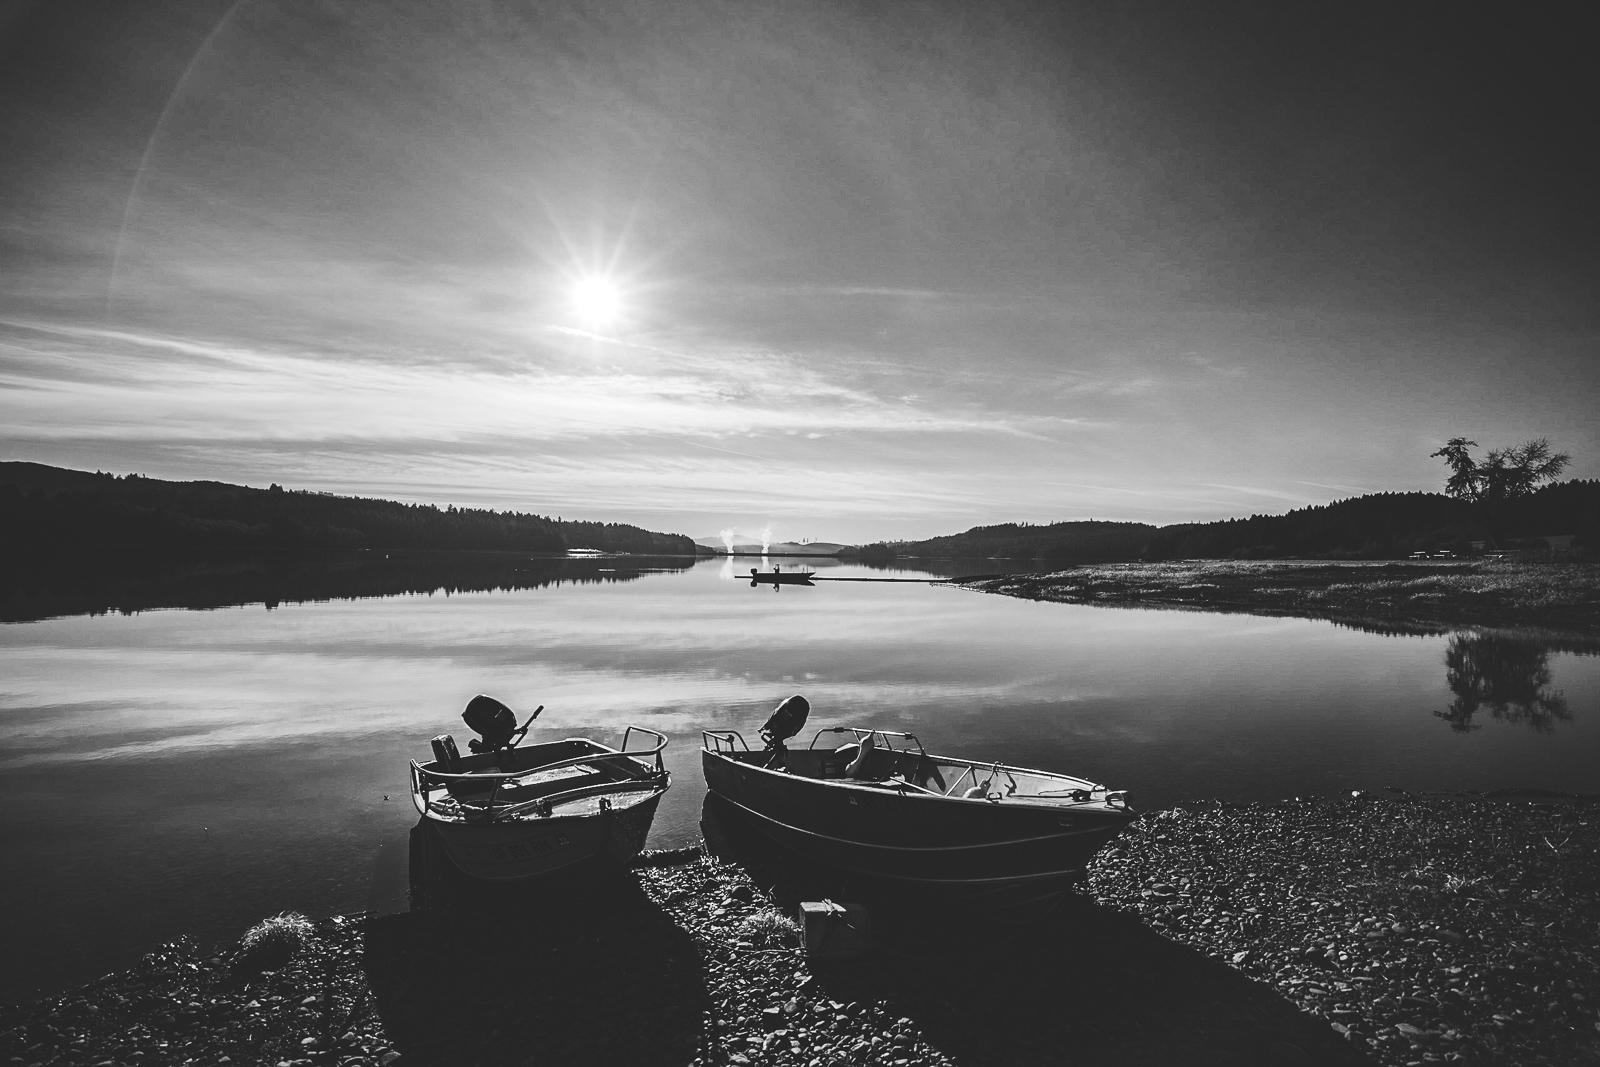 vltrr-detroit-collage-john-sippel-art-photography-portland-lake-nature.jpg